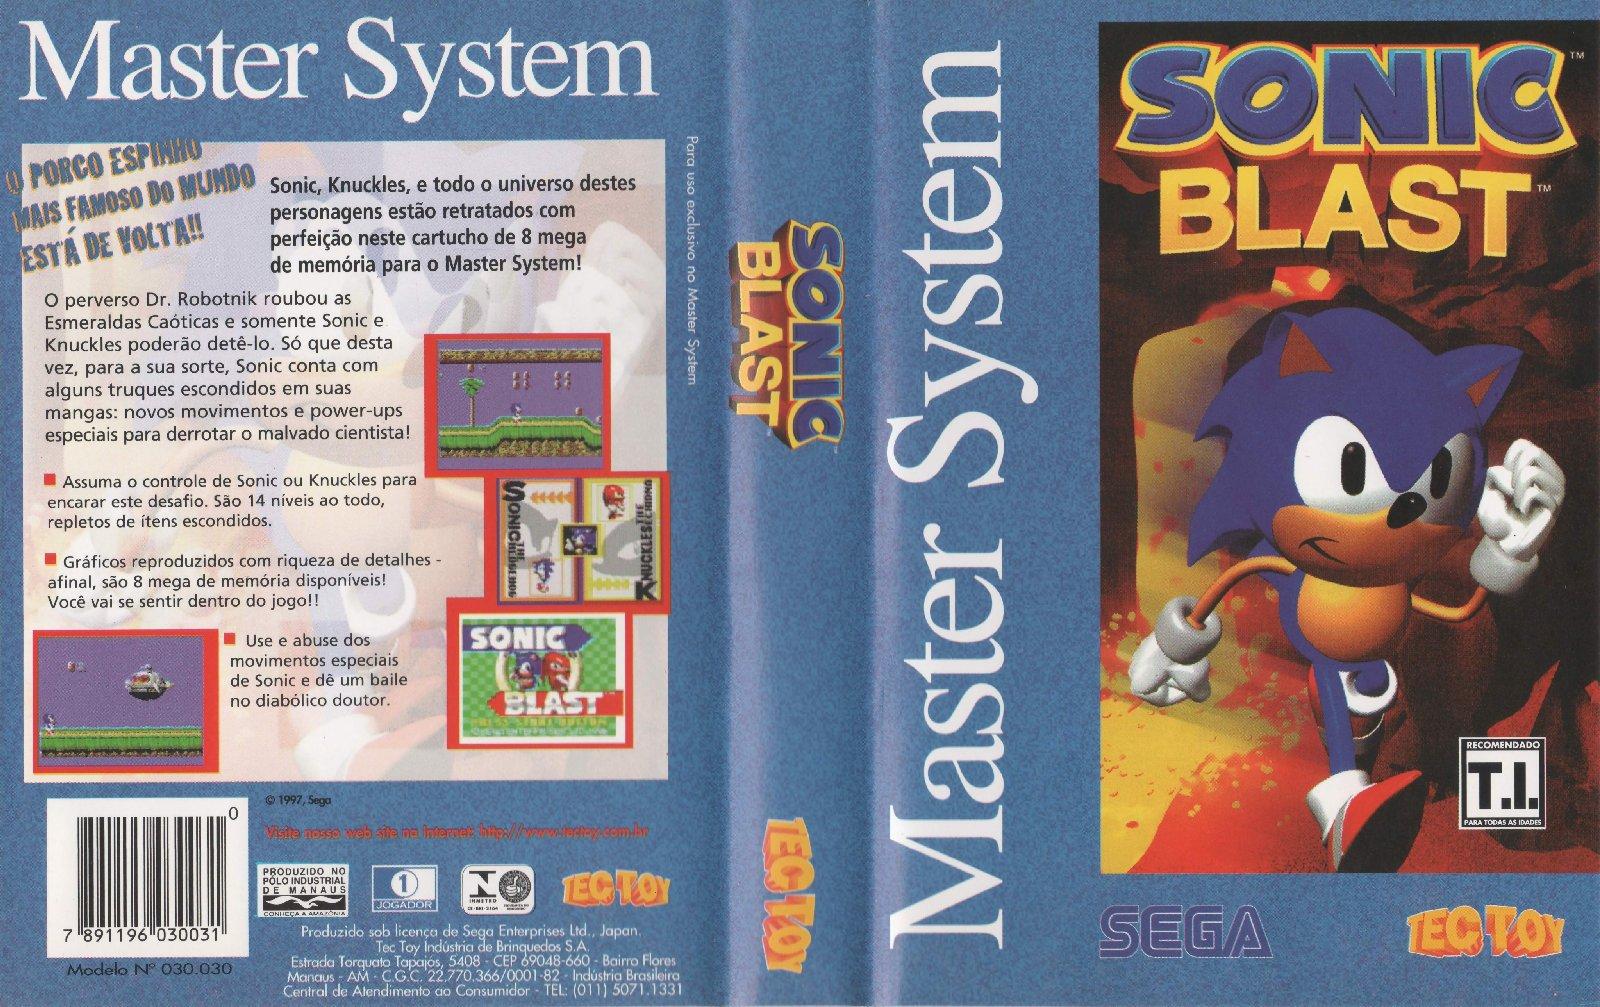 http://www.smspower.org/uploads/Scans/SonicBlast-SMS-BR-A.jpg